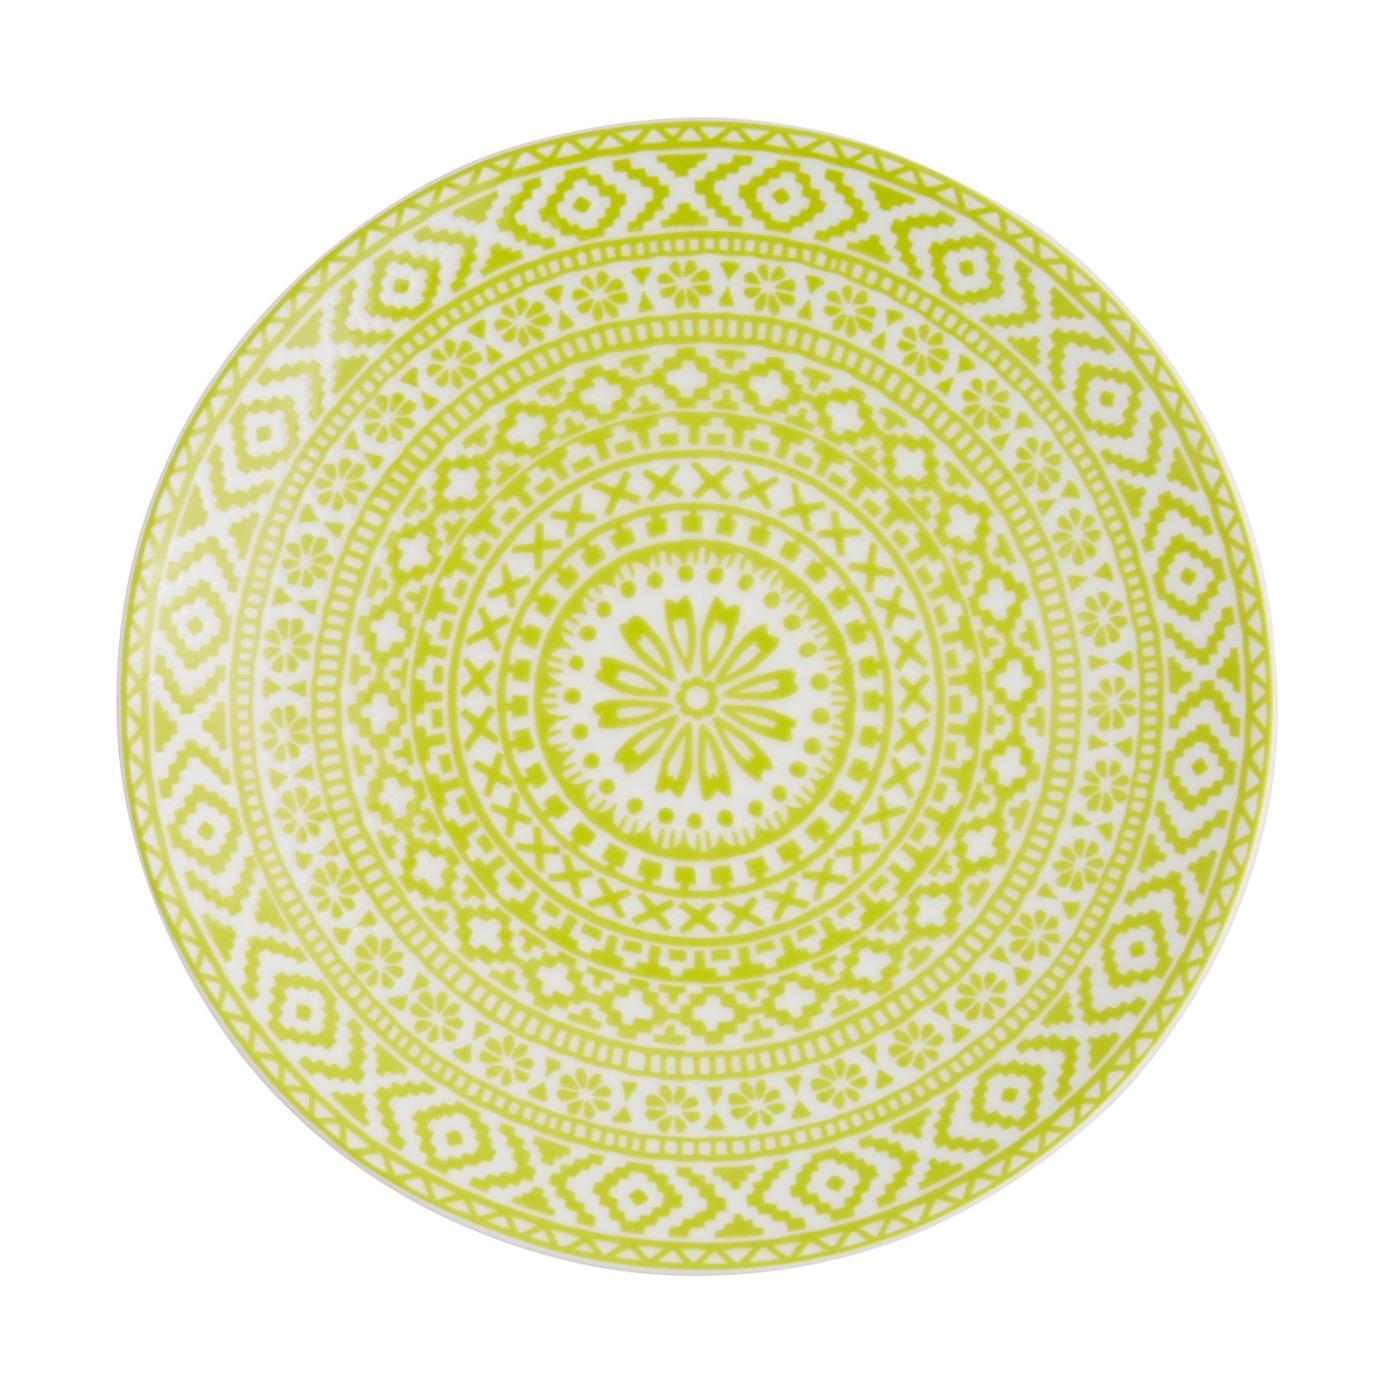 "Mayan Plate 8"" - Lime"